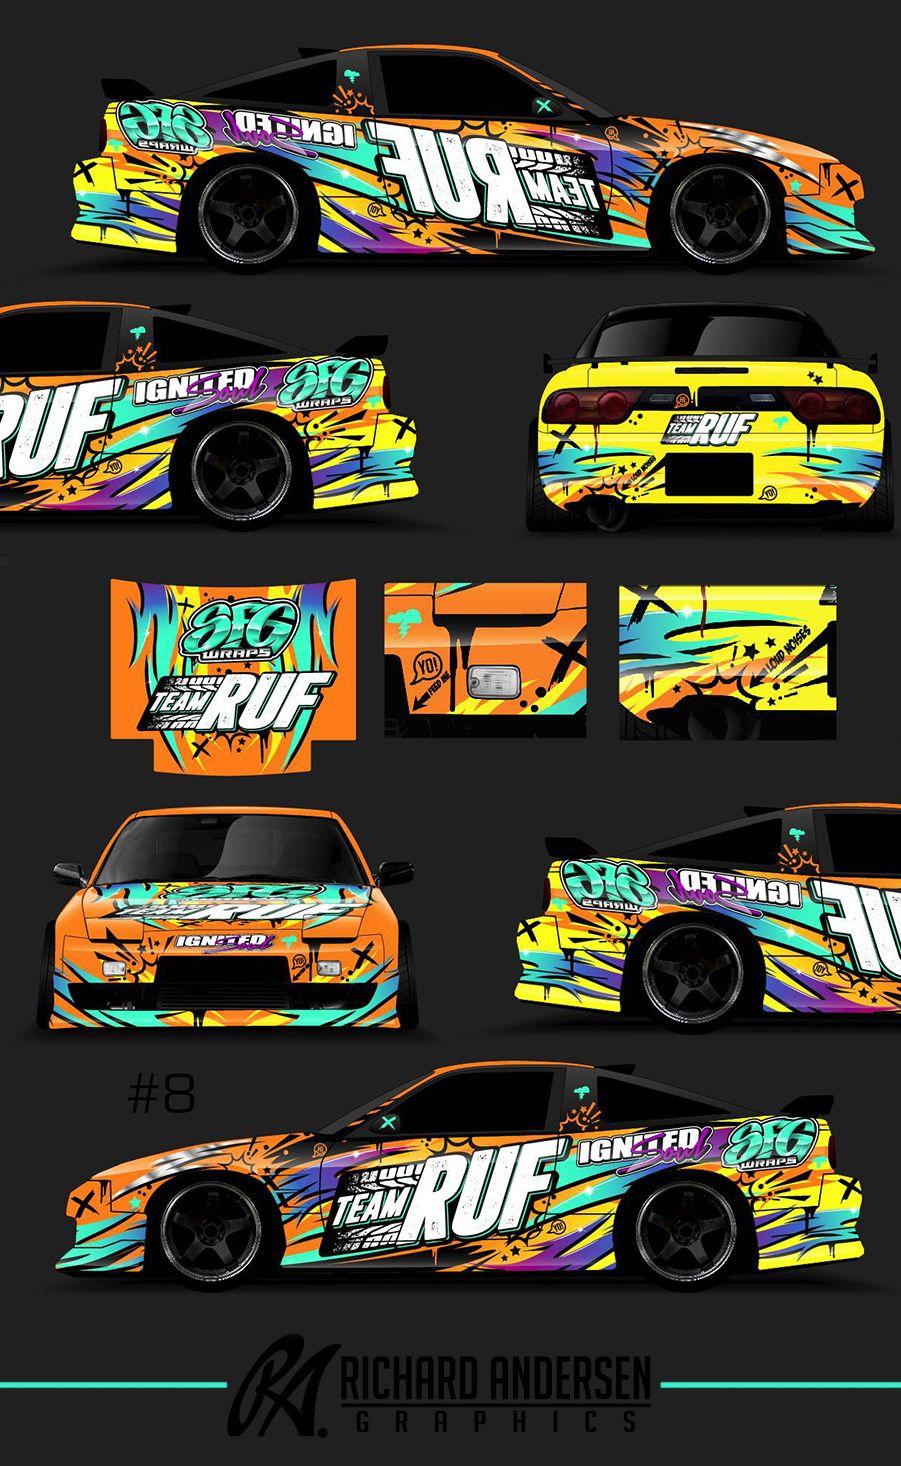 Team RUF Nissan 240z Drift-Spec livery | Car paintjob ideas